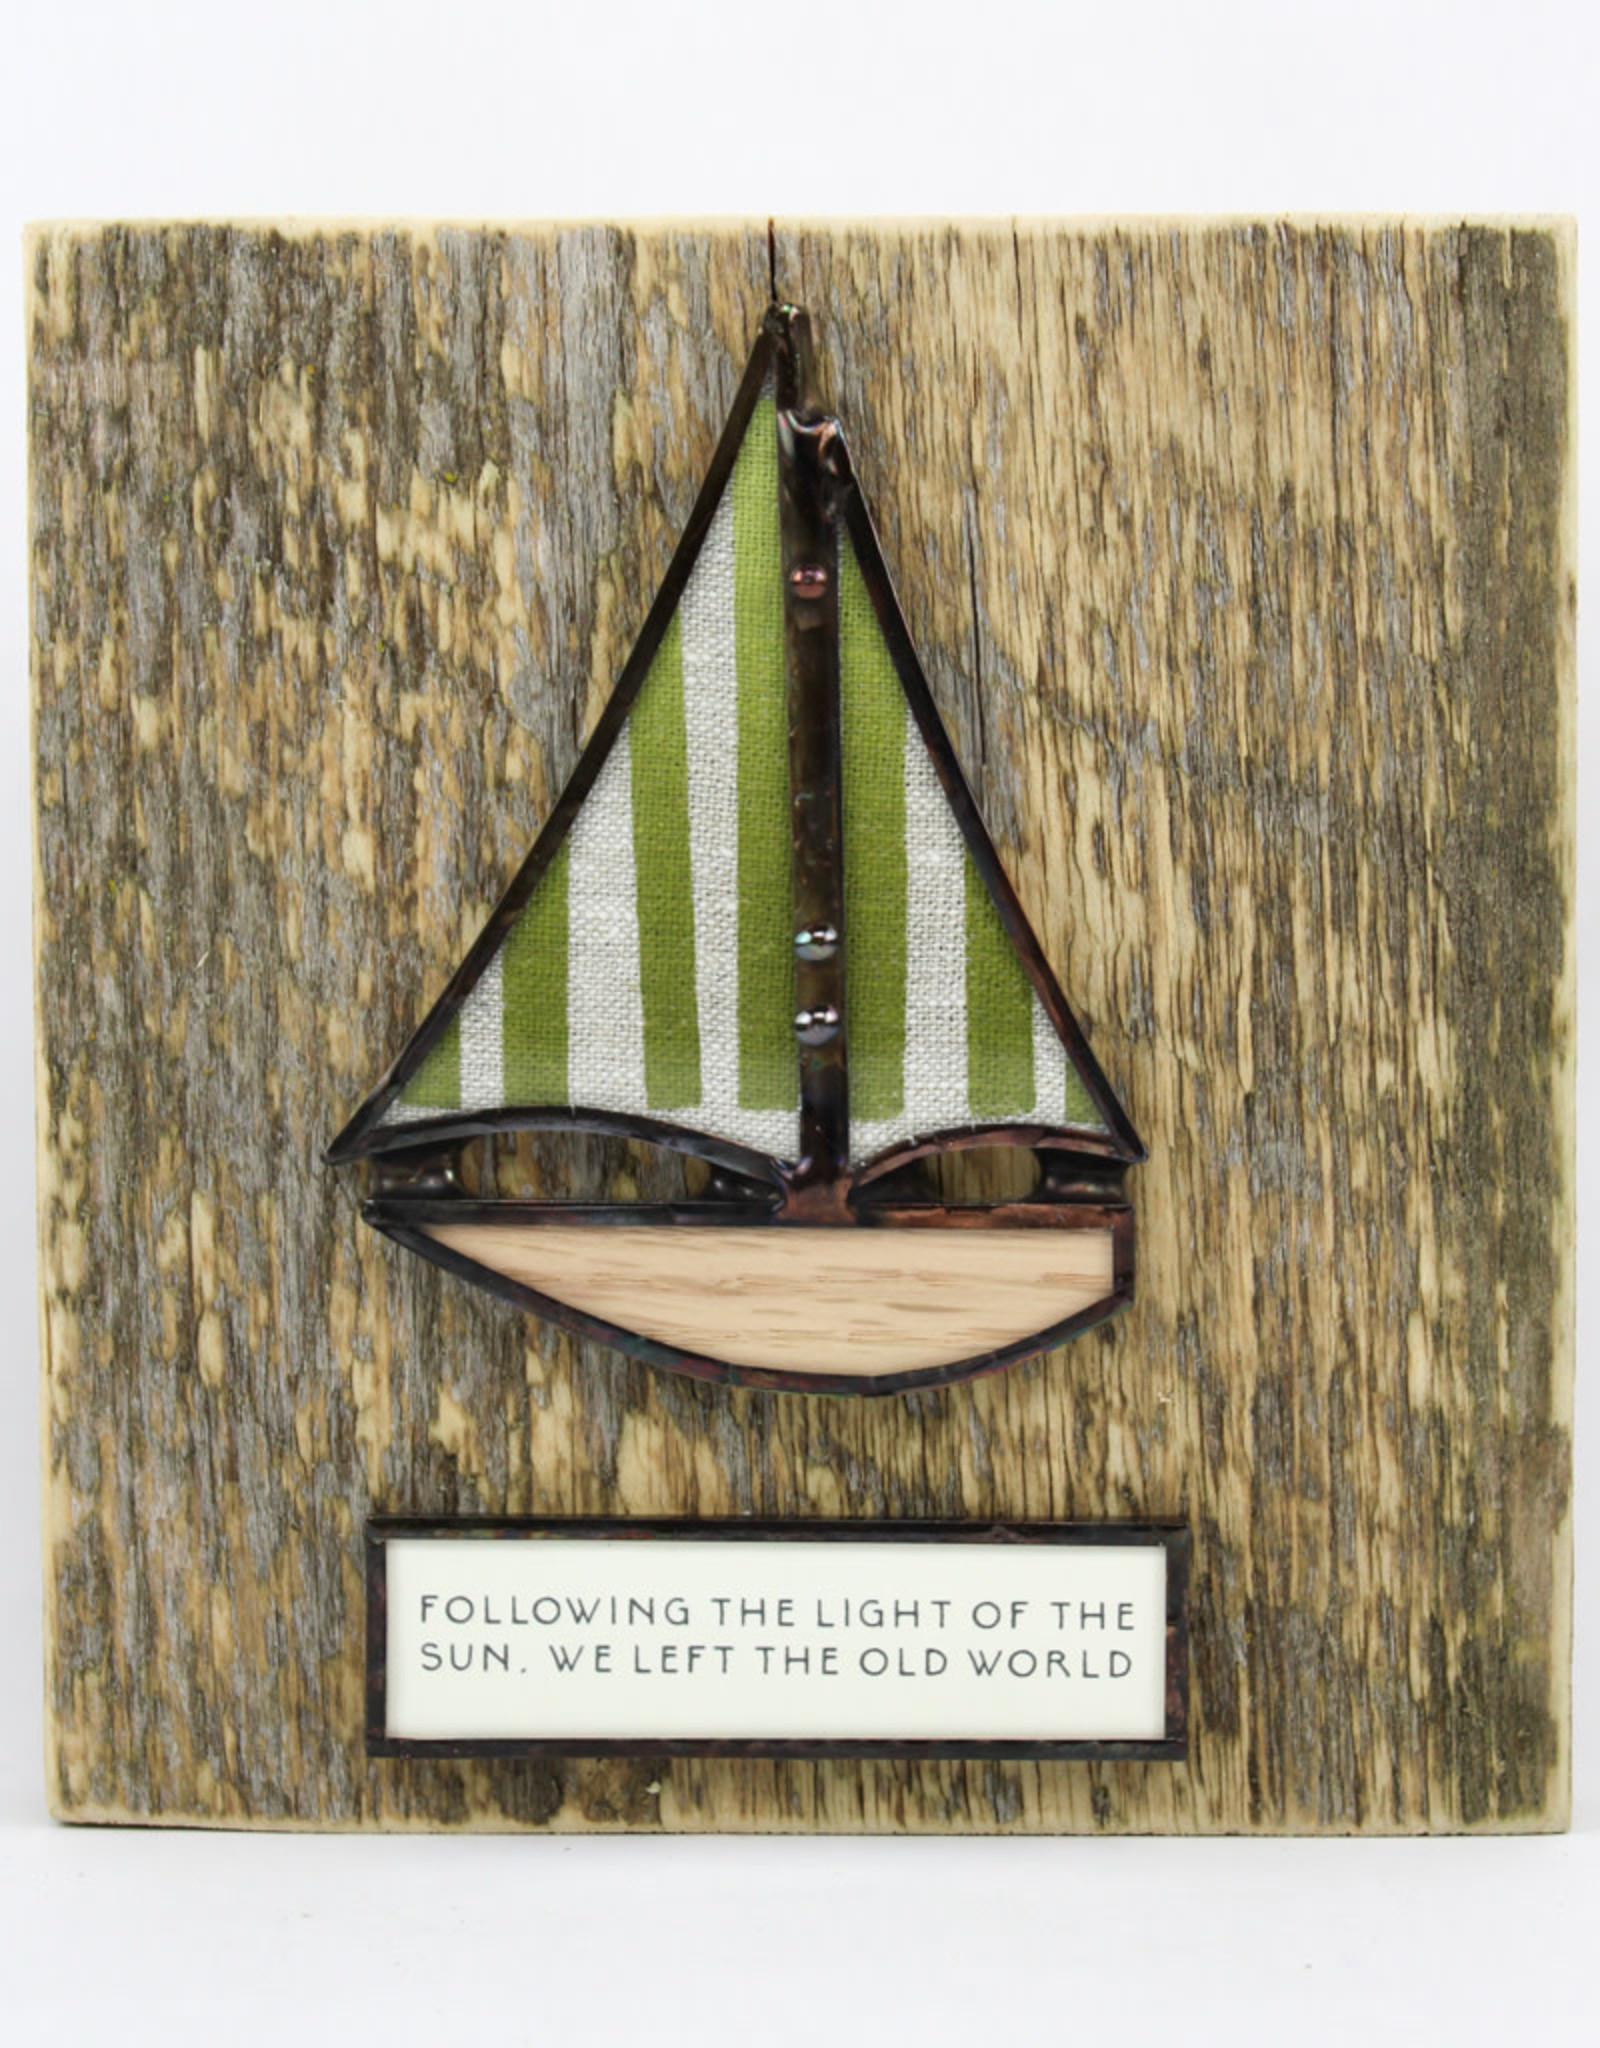 Bibleot Designs Wall Tile Sailboat Lake Time